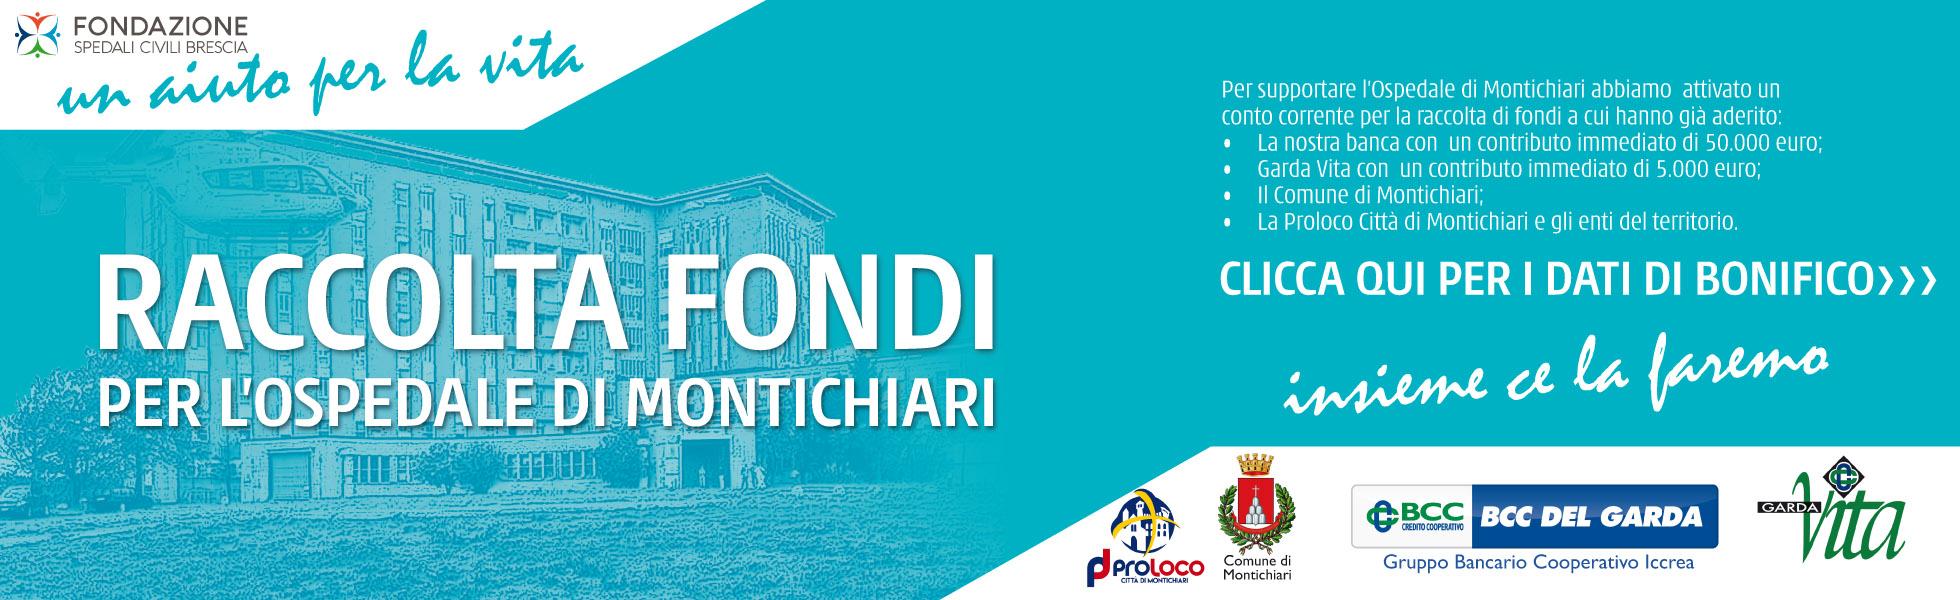 Raccolta Fondi Ospedale Montichiari